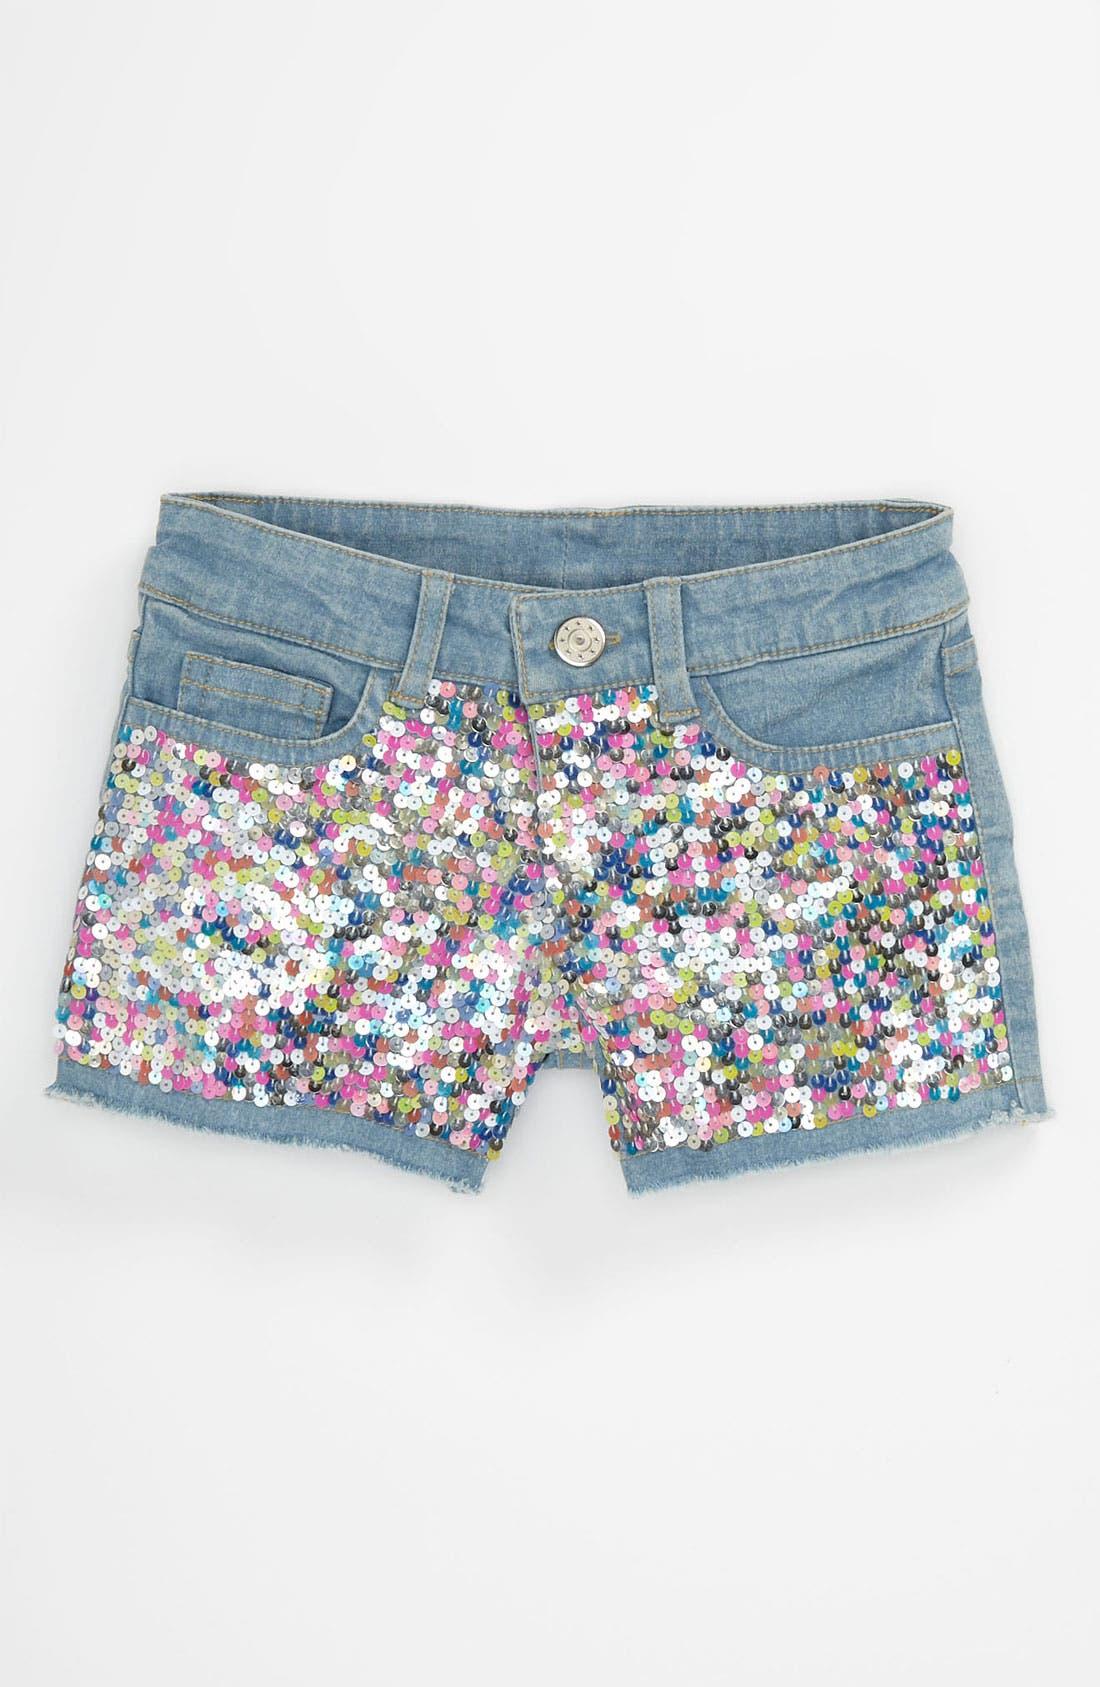 Main Image - Flowers by Zoe Sequin Denim Shorts (Big Girls)